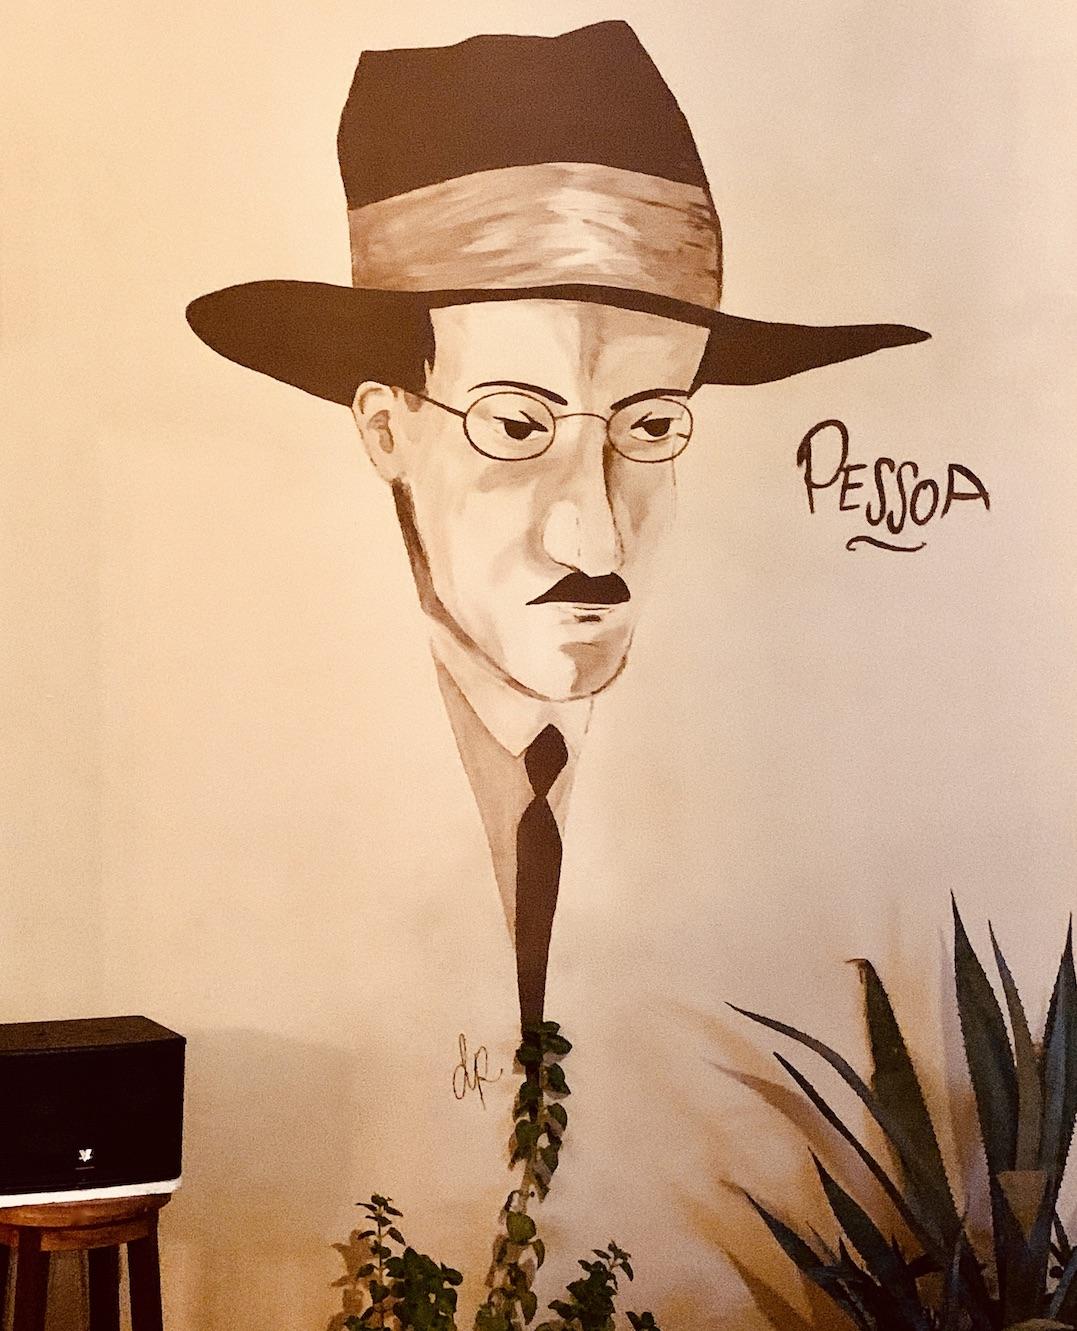 Fernando Pessoa mural Kampot Cambodia